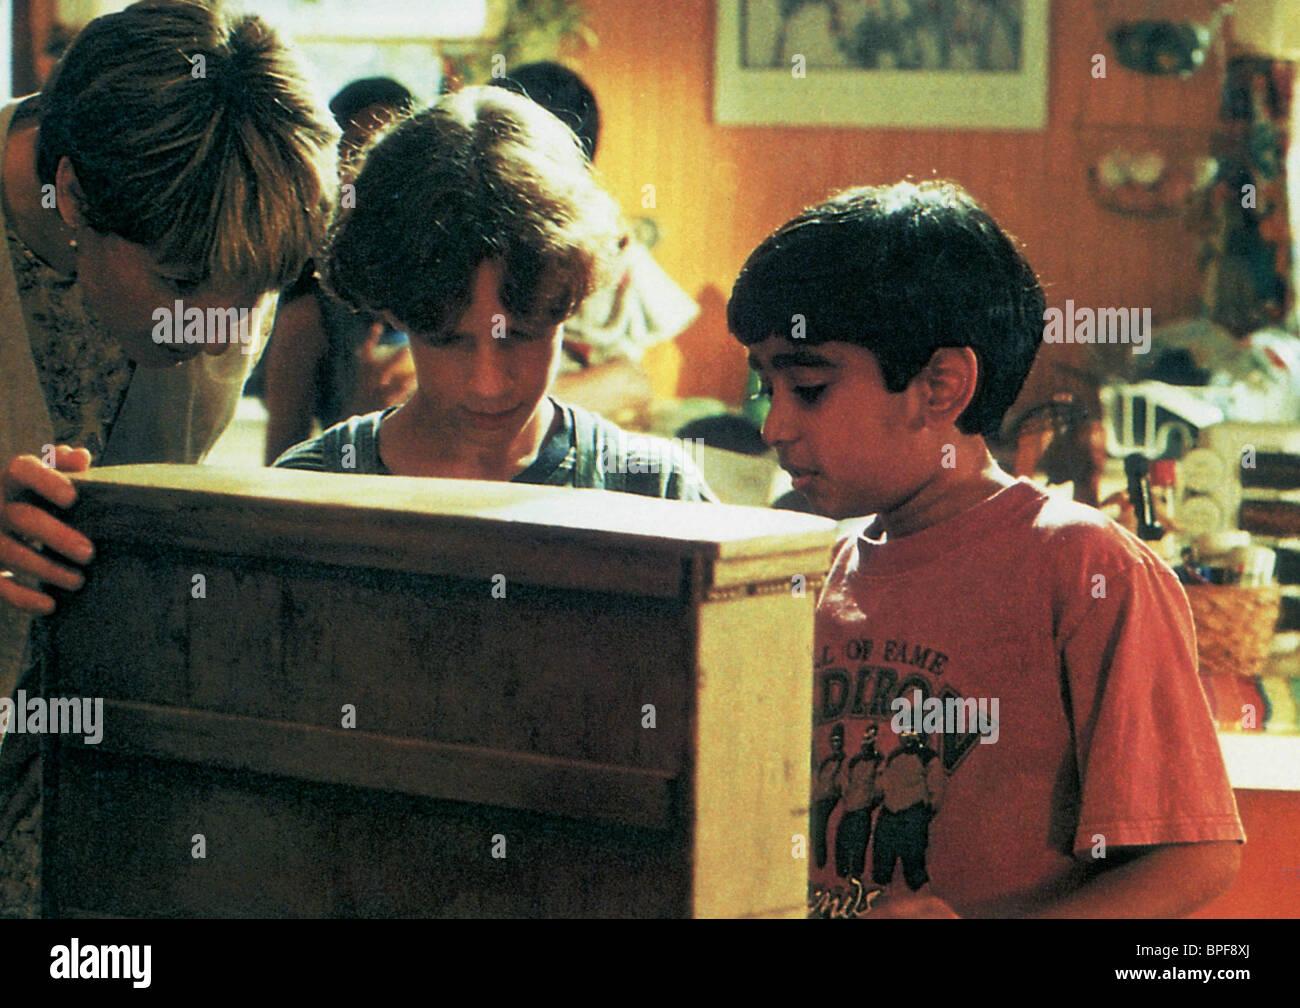 Hal Scardino Amp Rishi Bhat The Indian In The Cupboard 1995